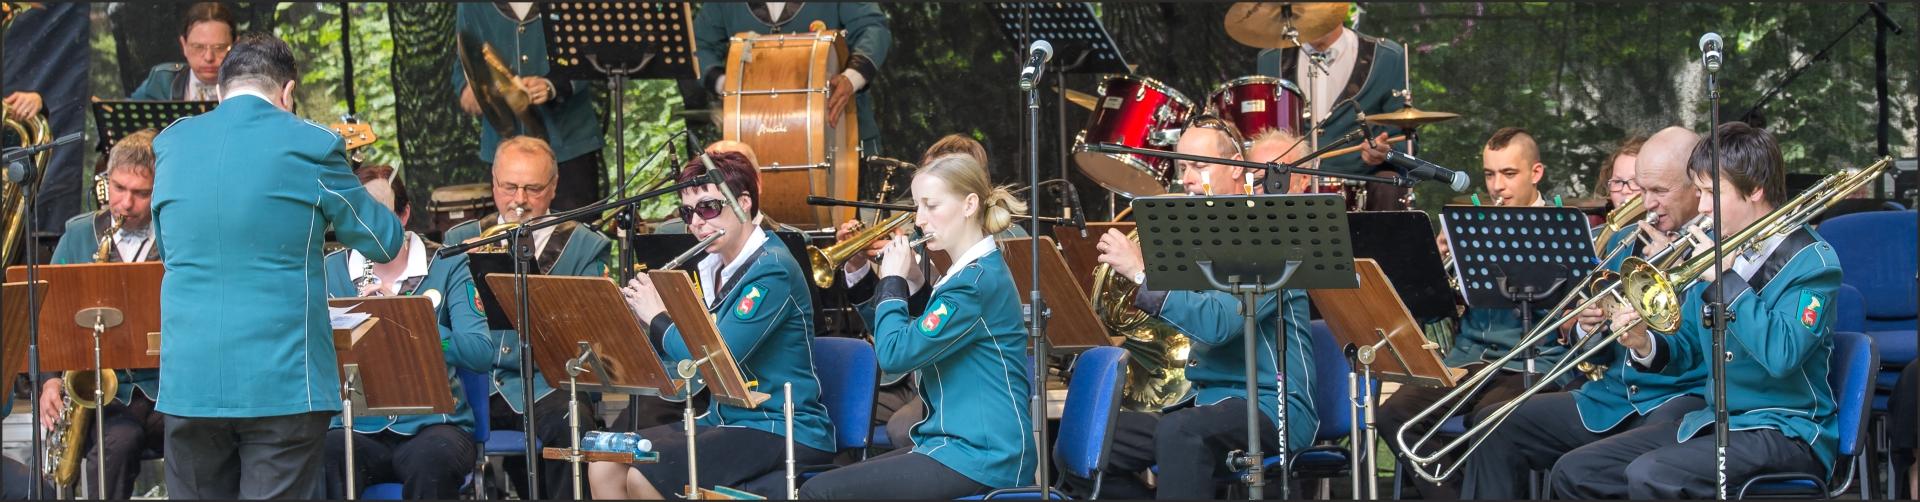 baner orkiestra